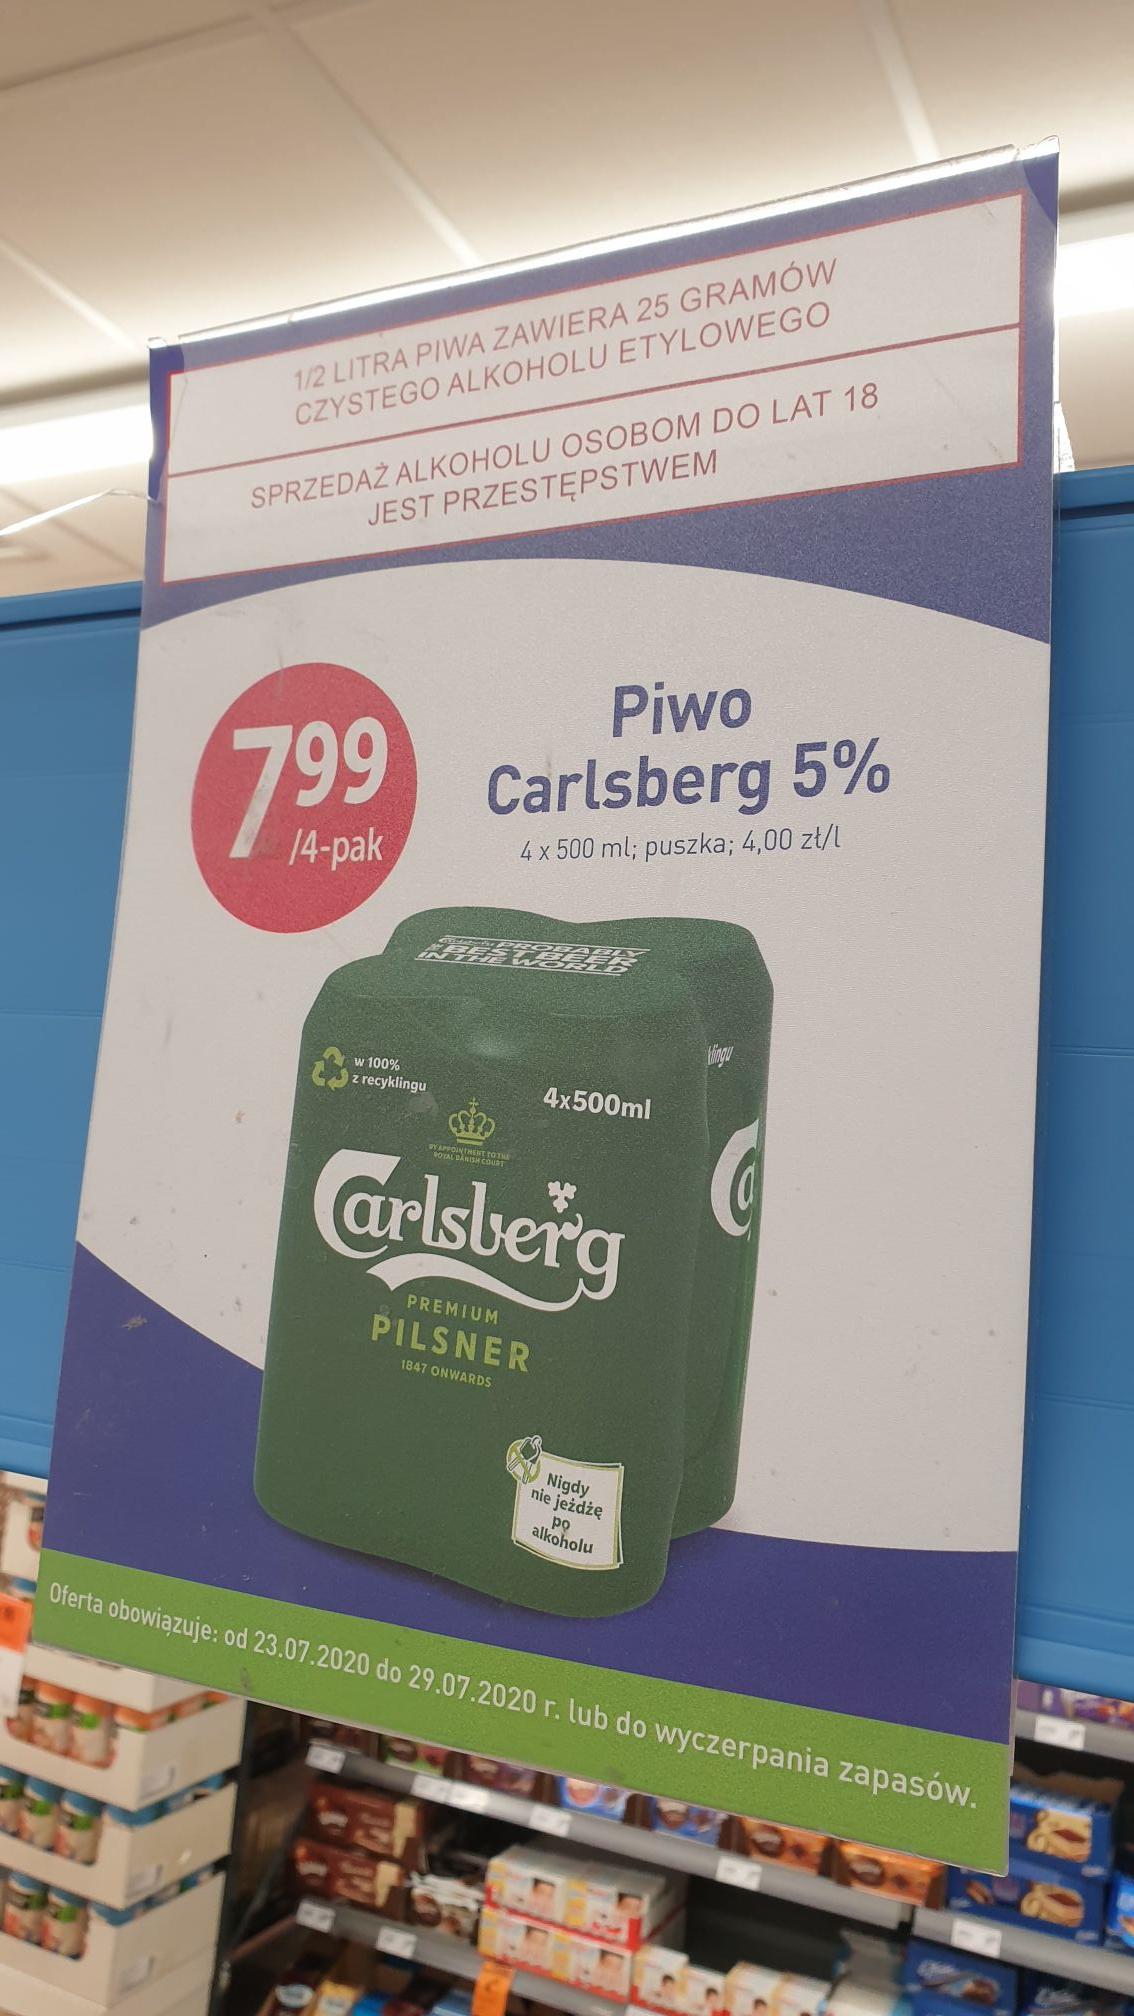 Carlsberg 4 pak Stokrotka Optima 1,99 sztuka